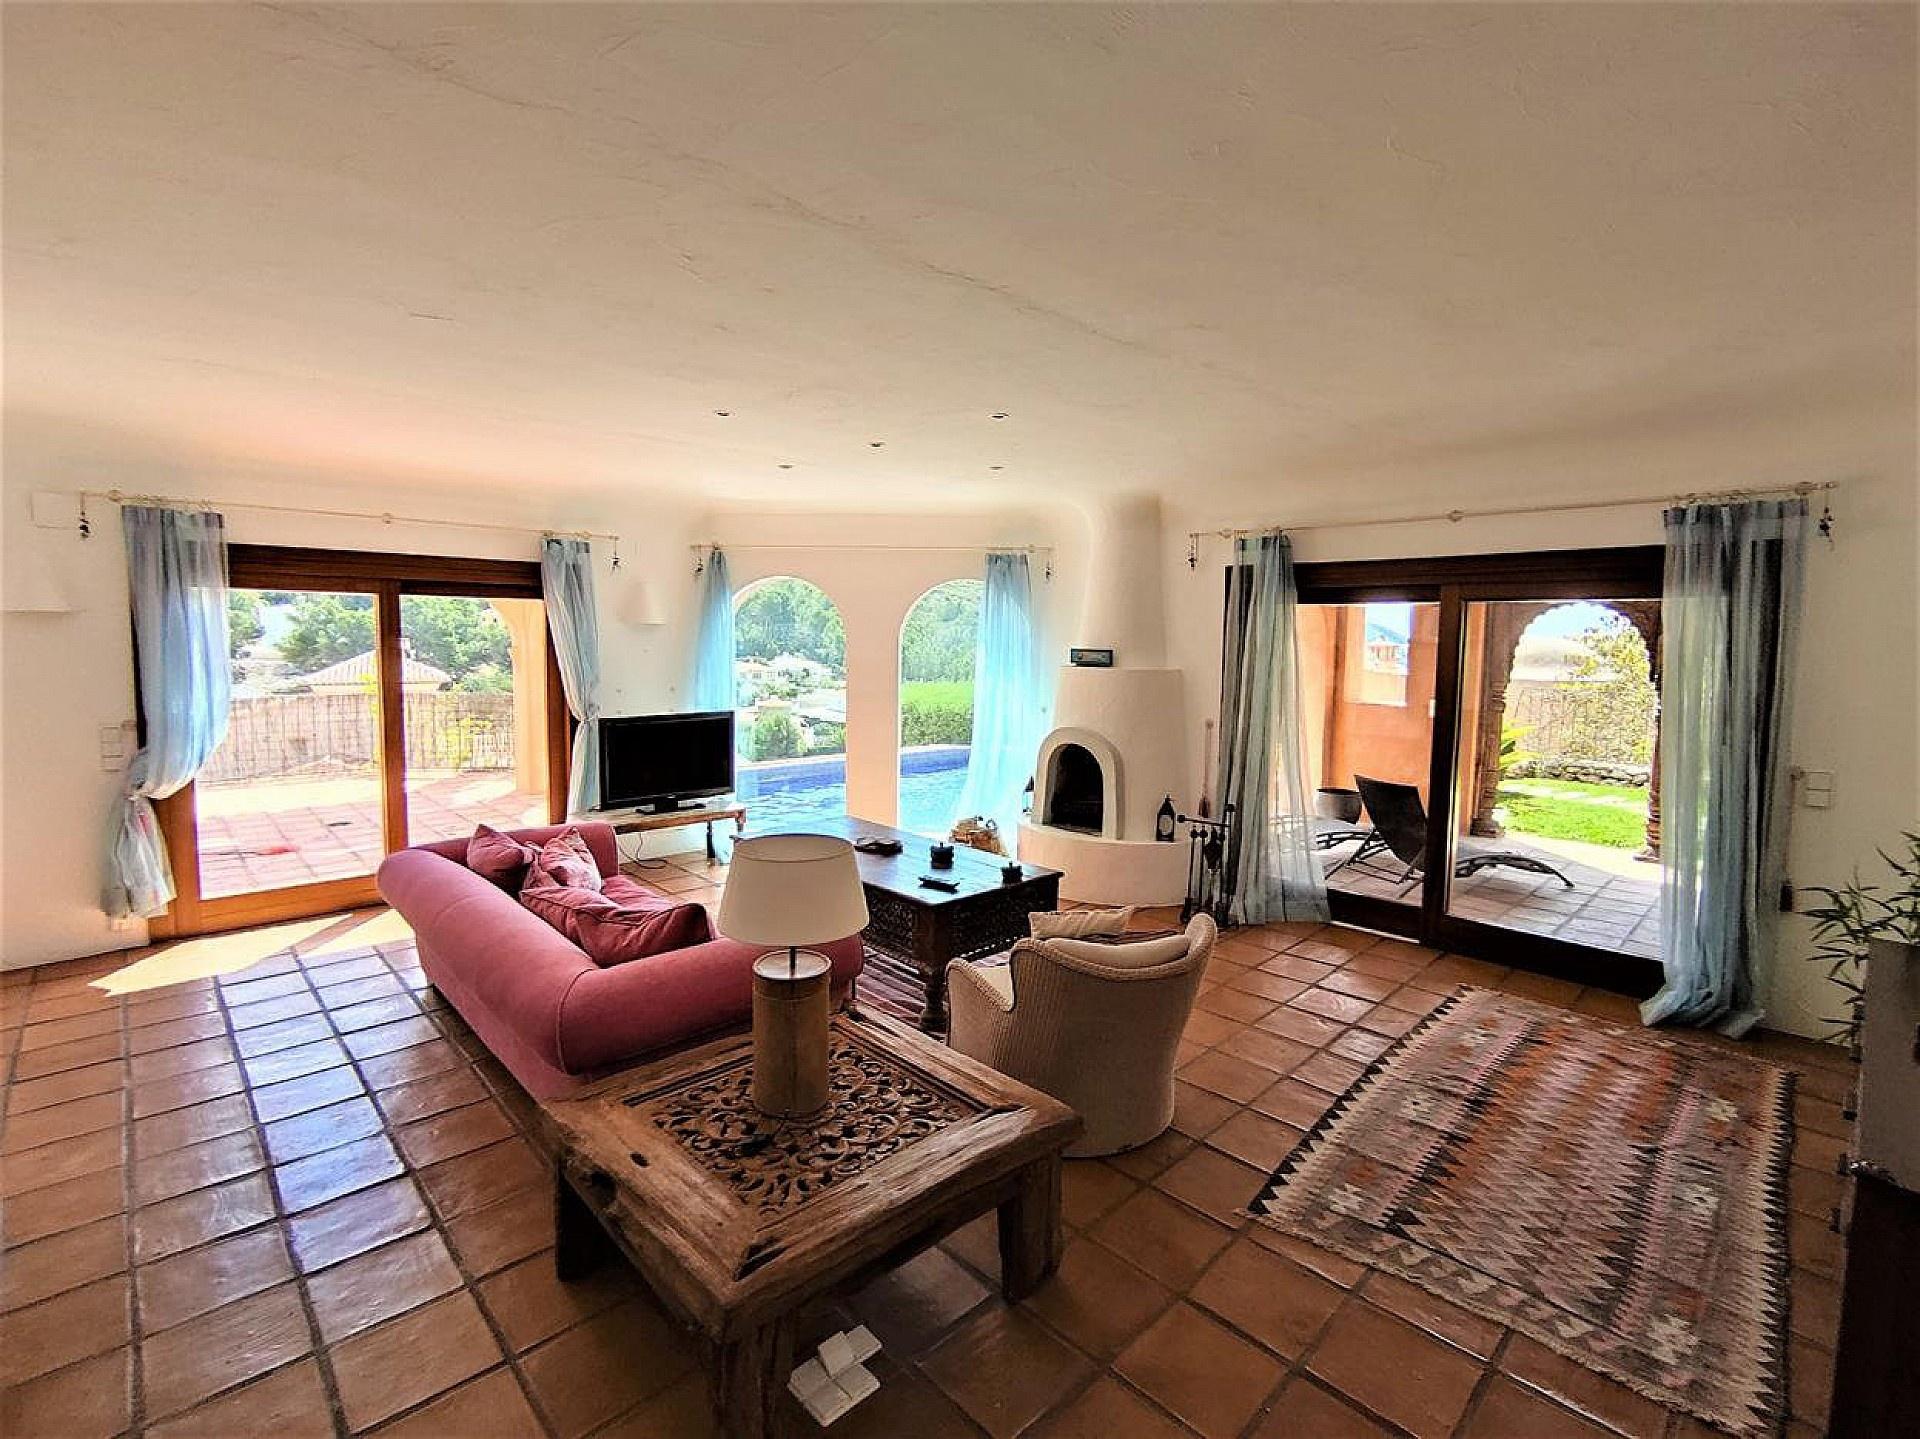 w_luxe-huis-moraira-costa-blanca-spanje-28.jpg